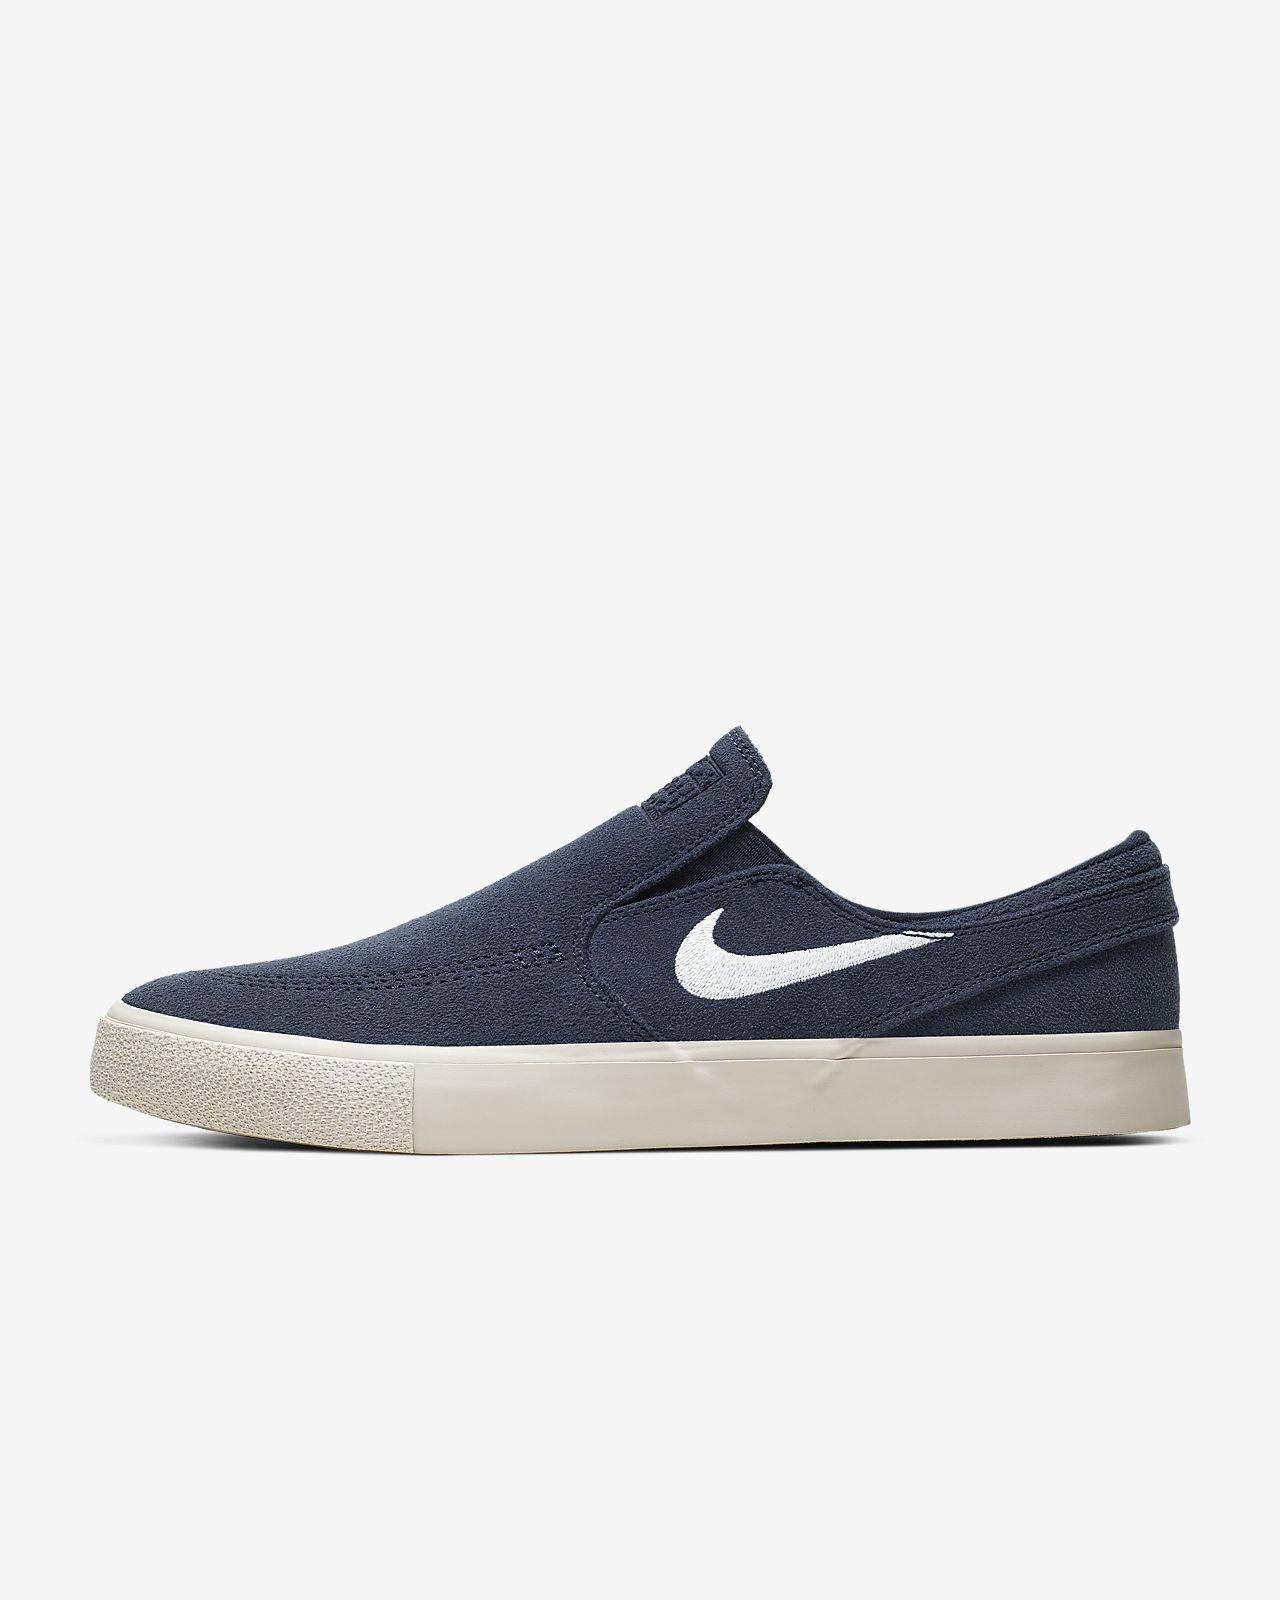 Nike SB Zoom Stefan Janoski Slip RM Skate Shoe